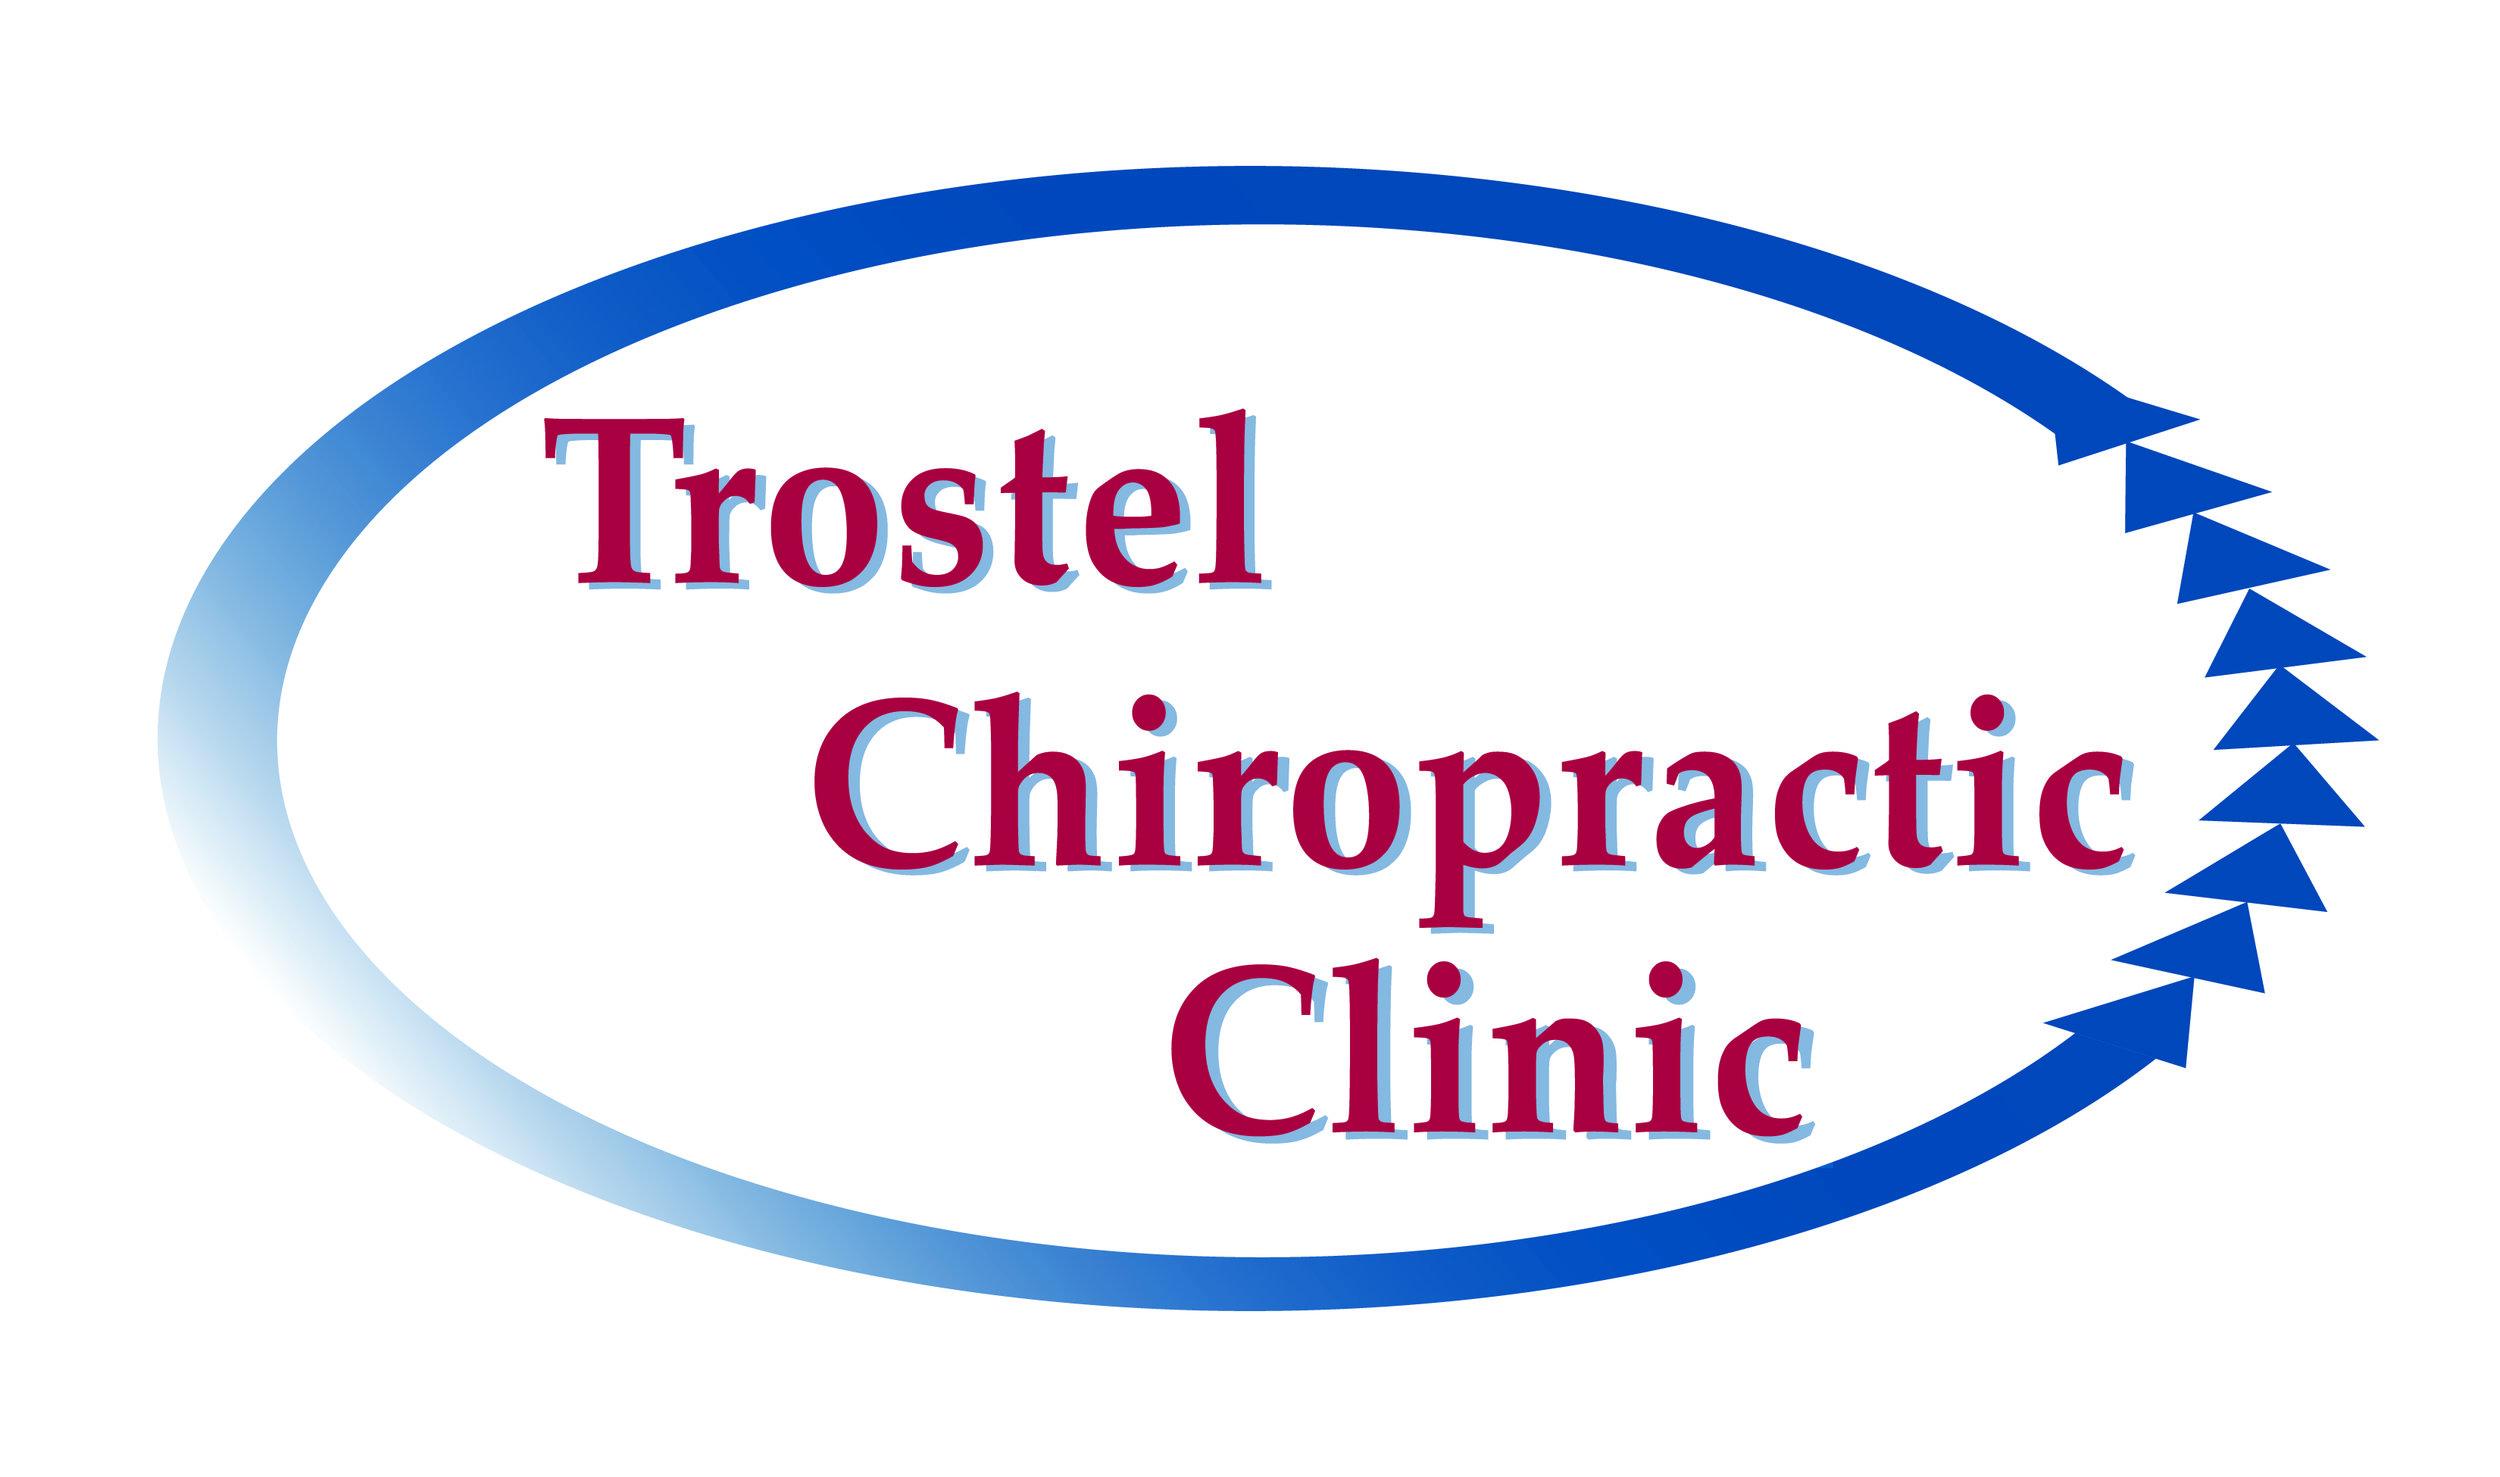 Trostel Chiropractic Clinic Logo.jpg